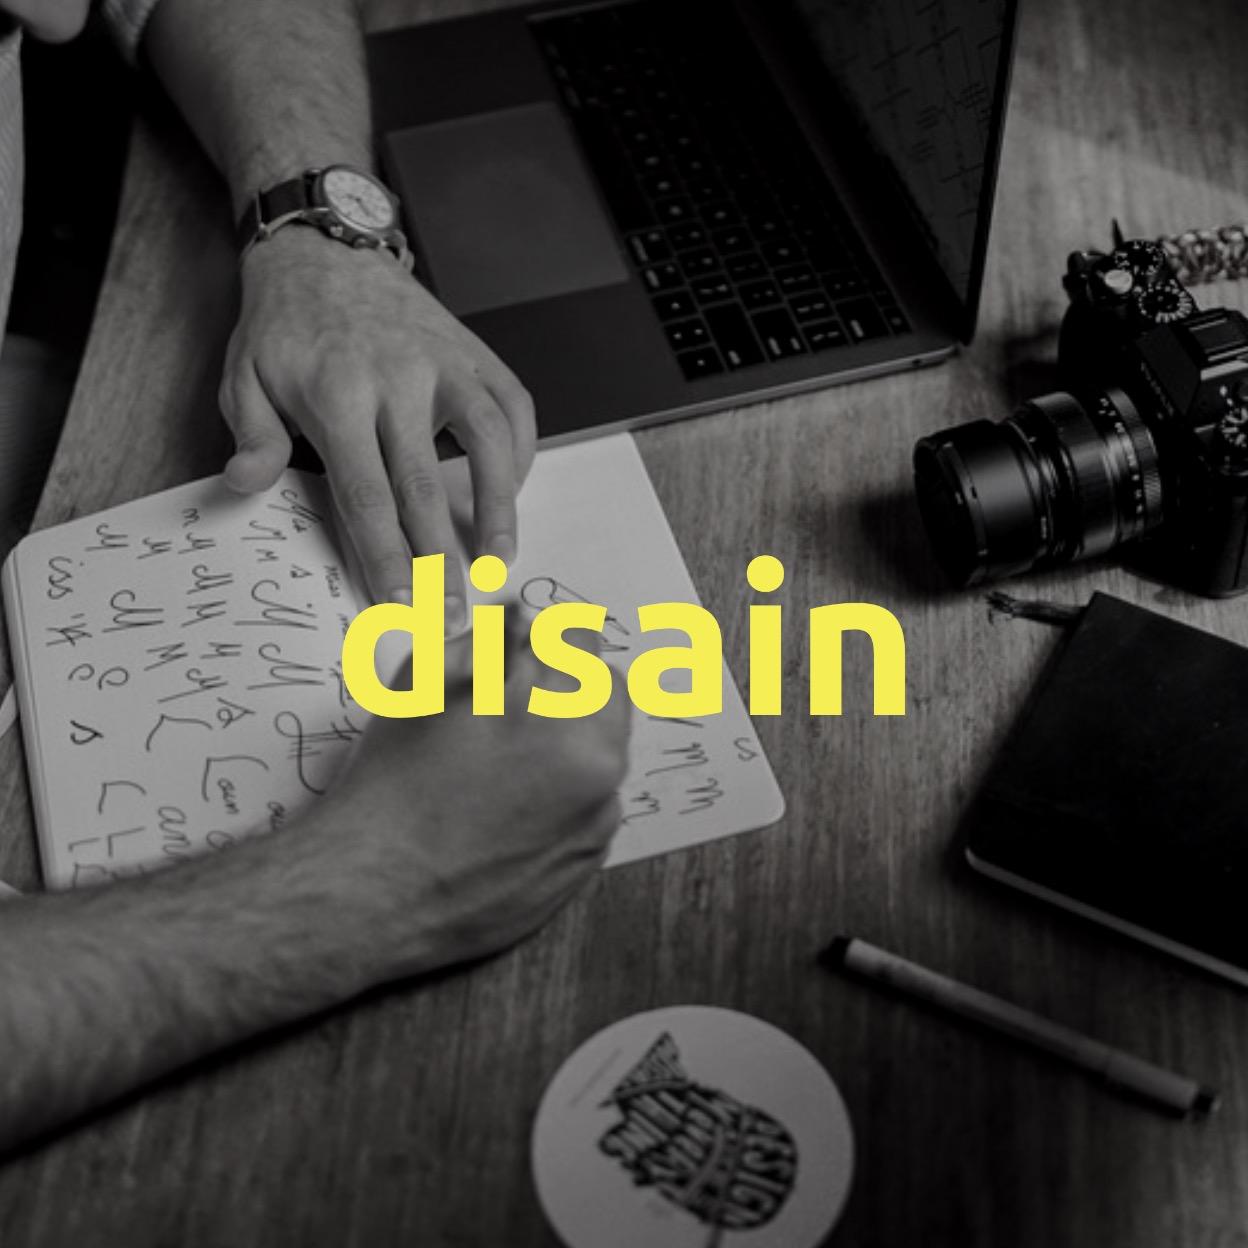 Disain